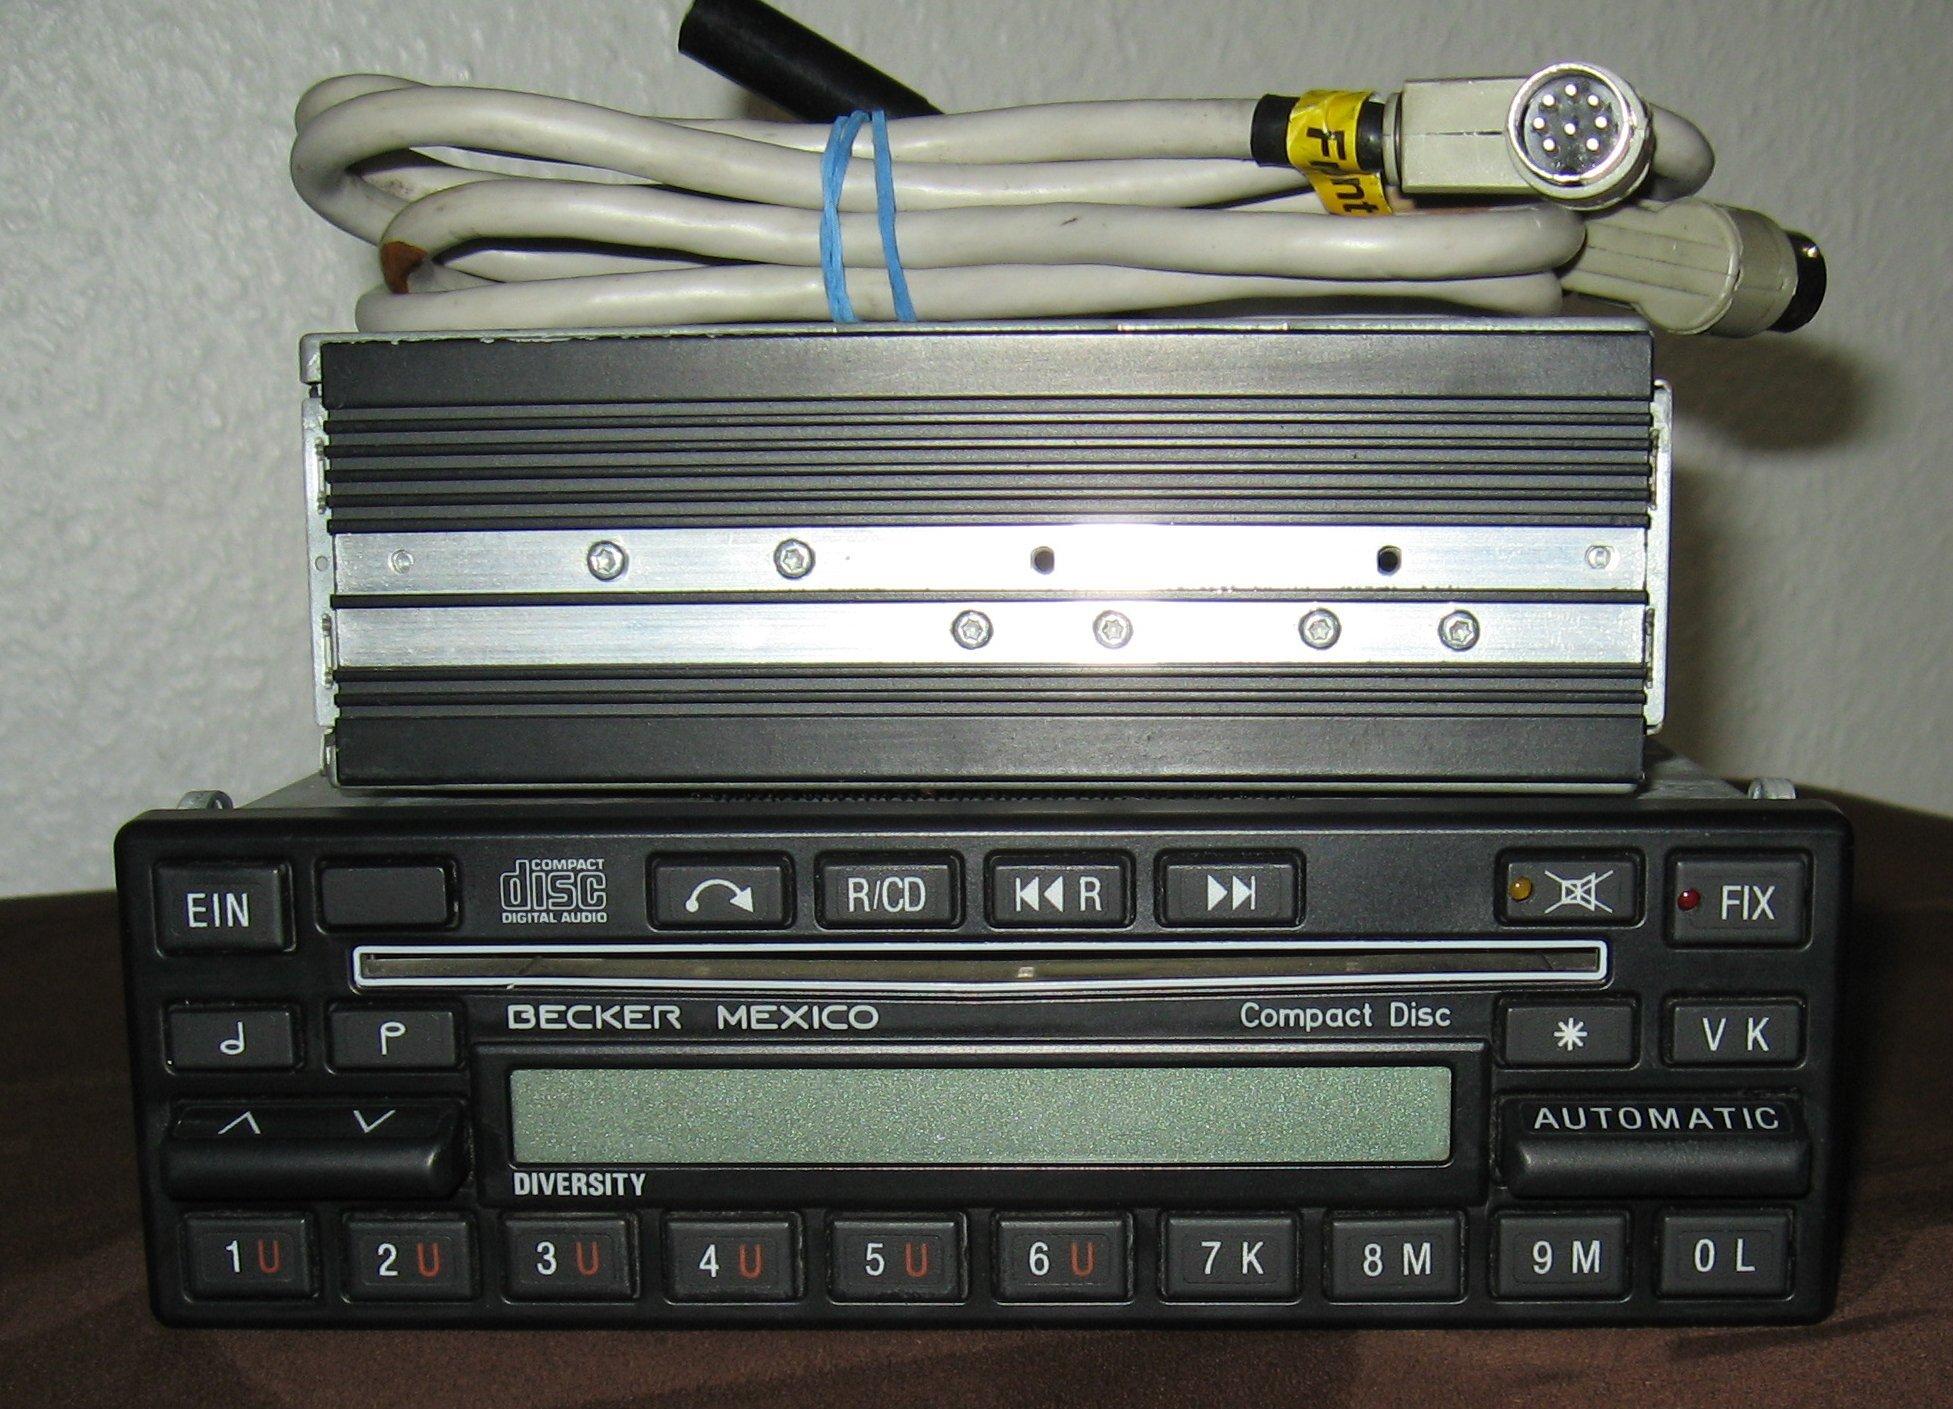 ist das becker mexico cd radio mit dem aktivbasssystem. Black Bedroom Furniture Sets. Home Design Ideas